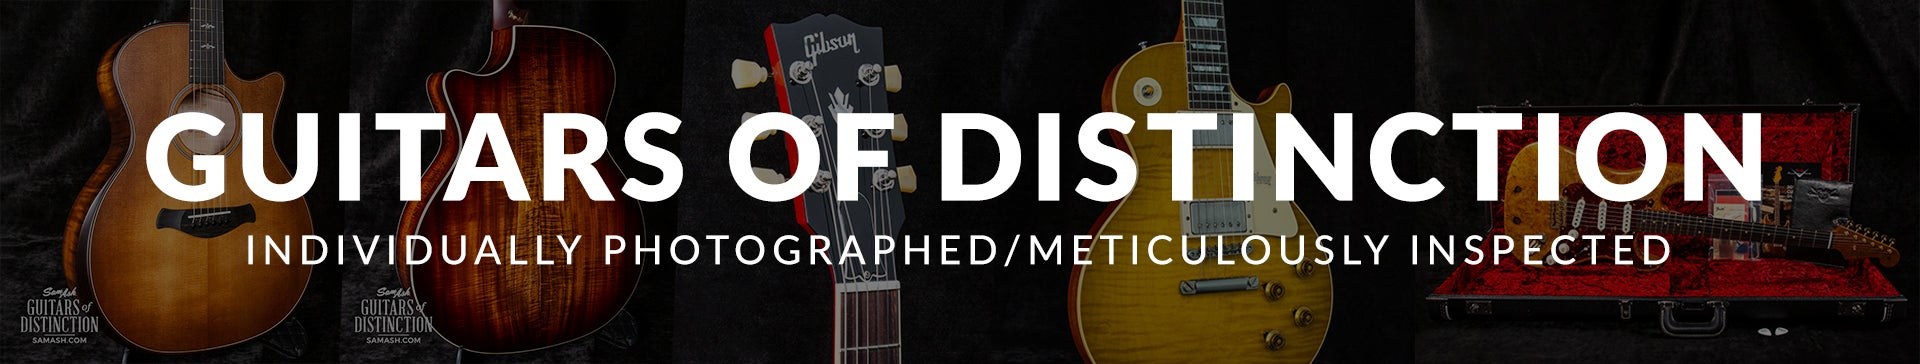 Shop Guitars of Distinction at SamAsh.com